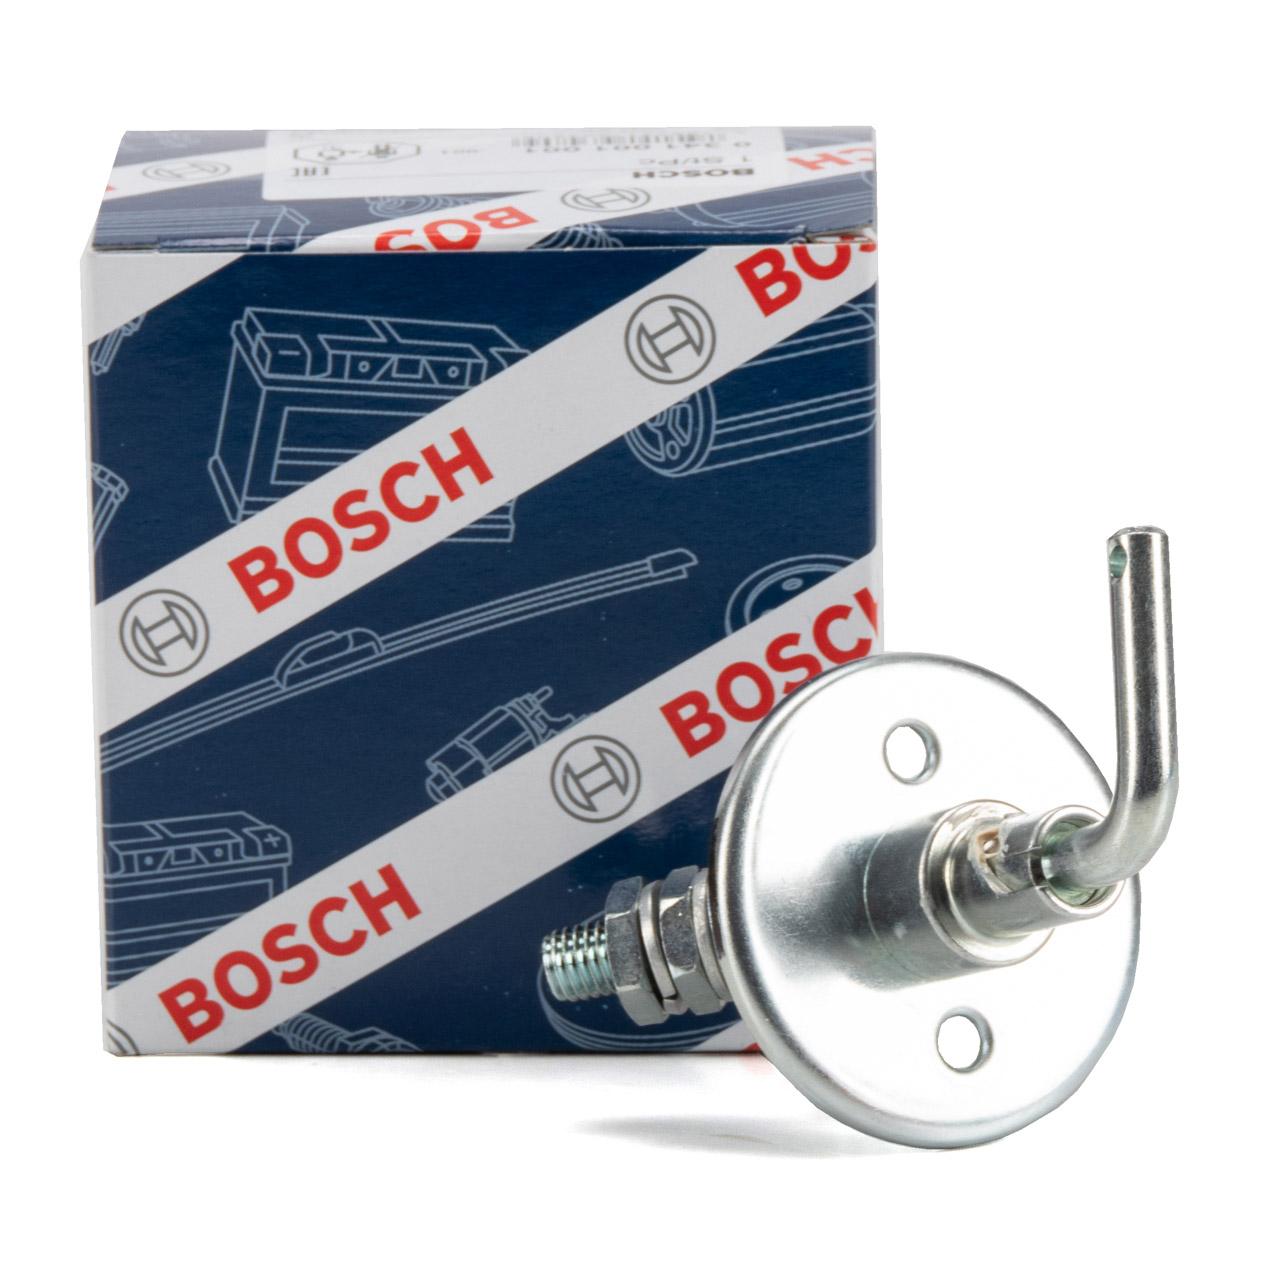 BOSCH 0341001001 Hauptschalter Batterie für FAUN FENDT HARVESTER MAN SCANIA VW